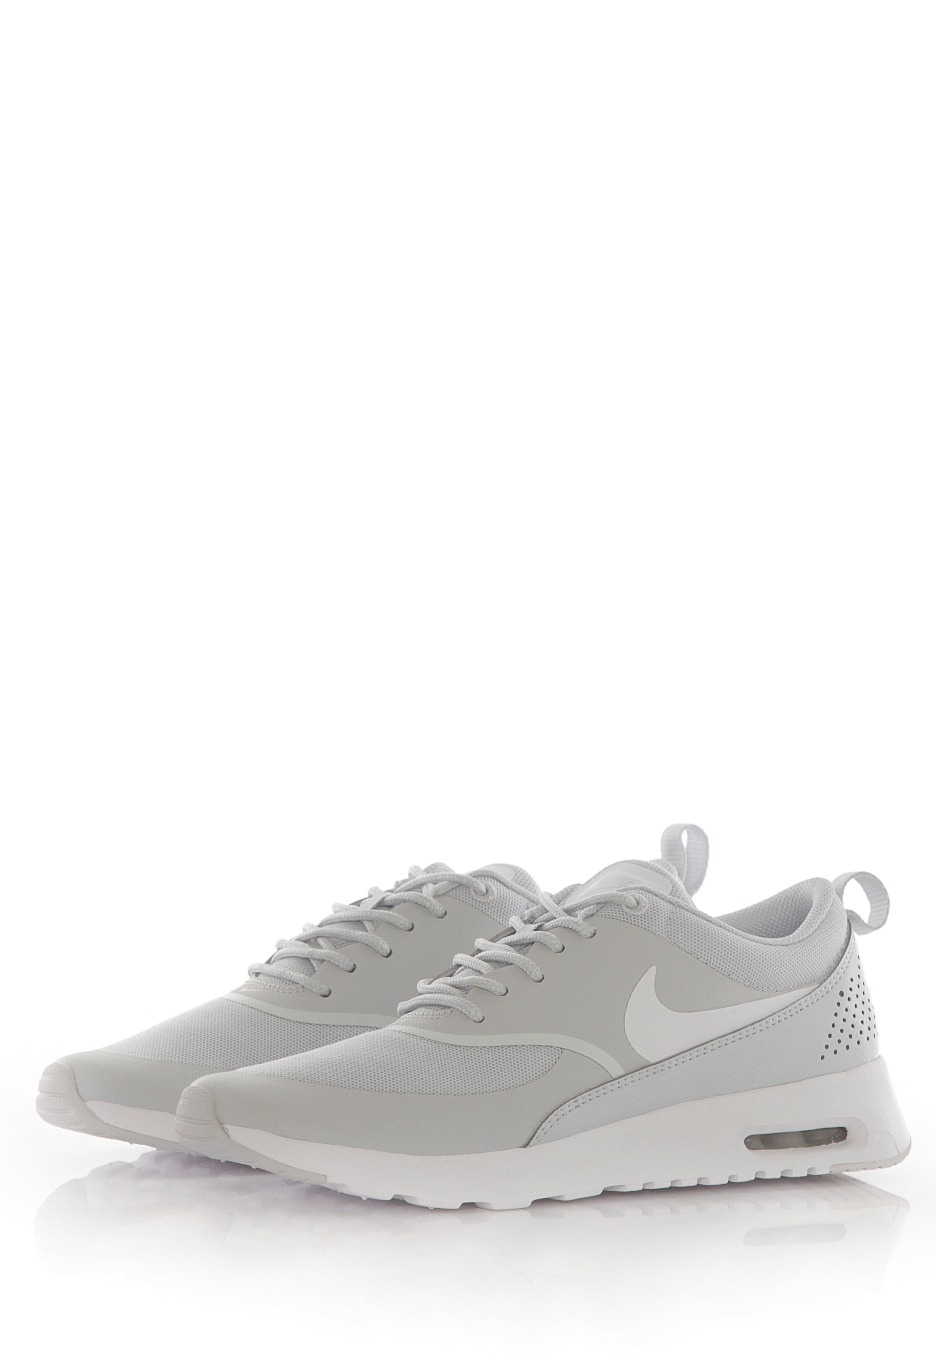 Fille Platinumwhite Nike Thea Rwwqh Chaussures Air Pure Pour Max O0nwkP